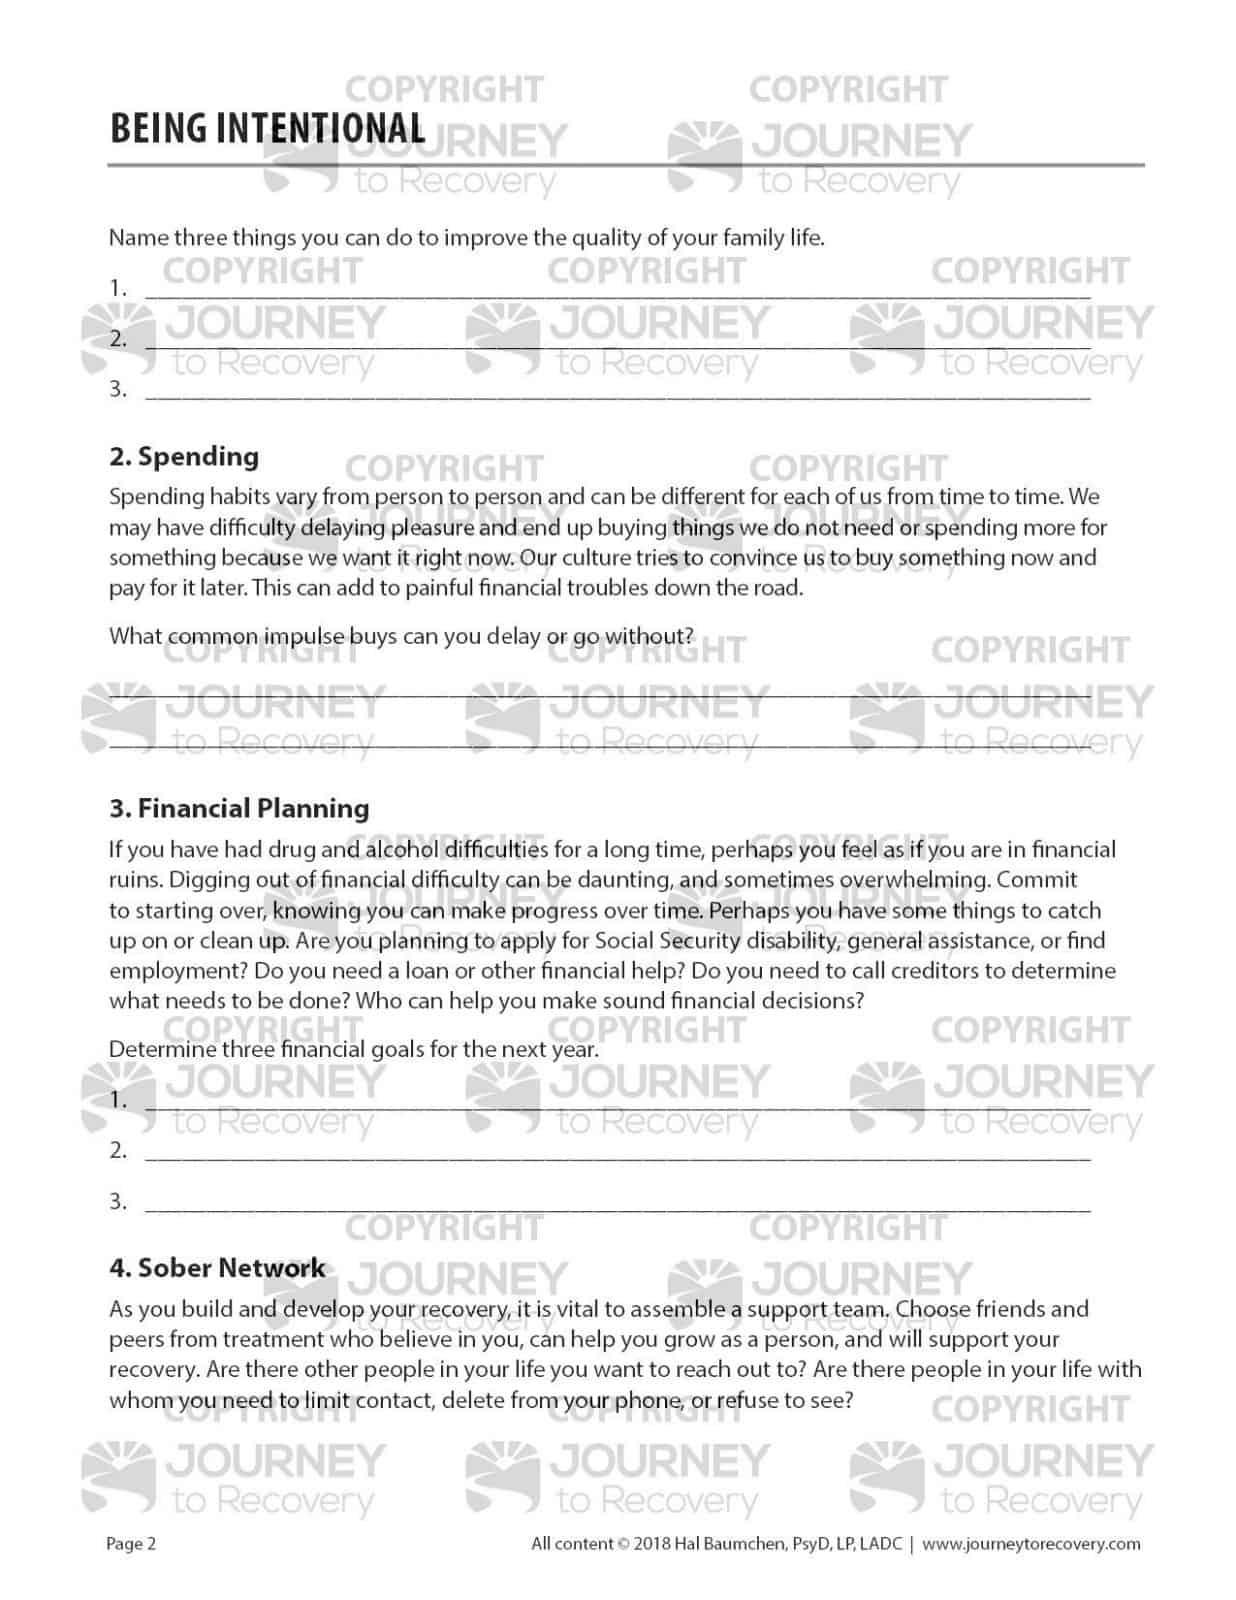 Being Intentional Cod Worksheet